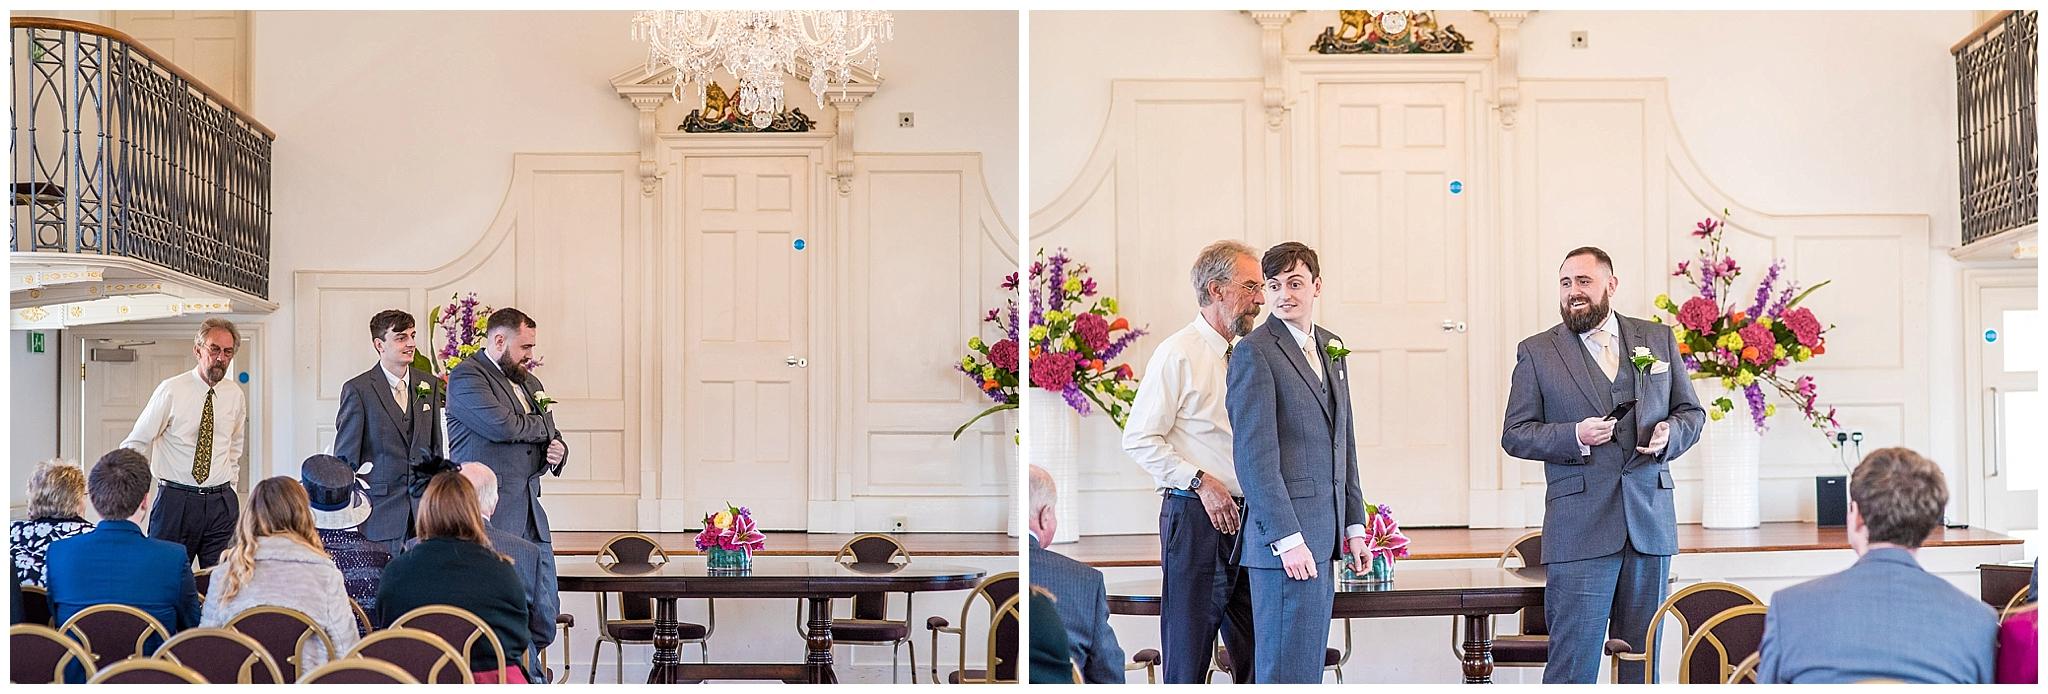 Lisa-&-Michael-Wedding-Guildhall-&-Hotel-Du-Vin-36